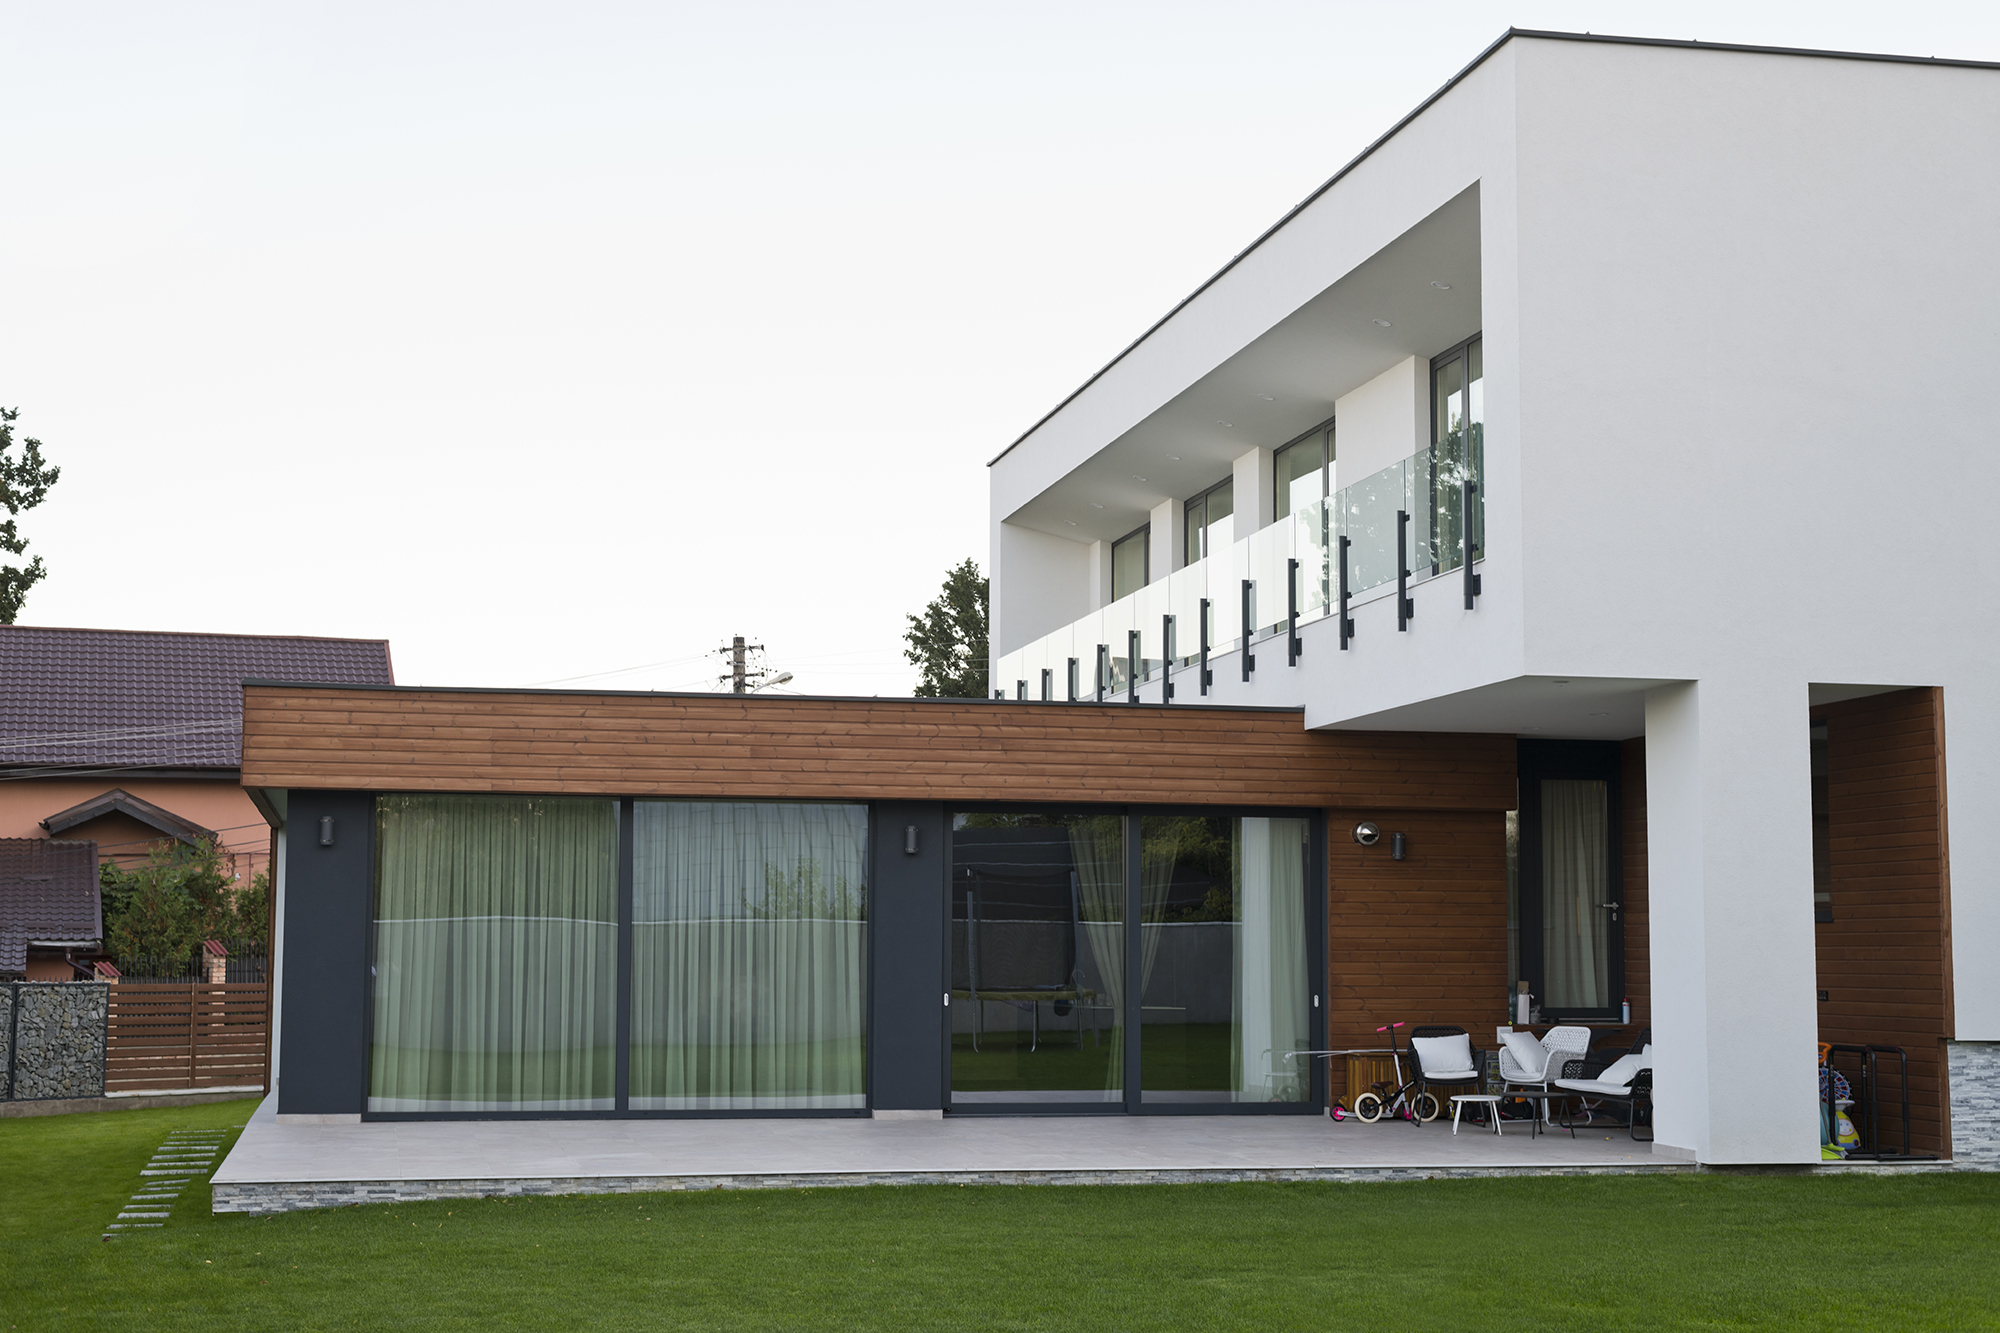 Proiect rezidential 9